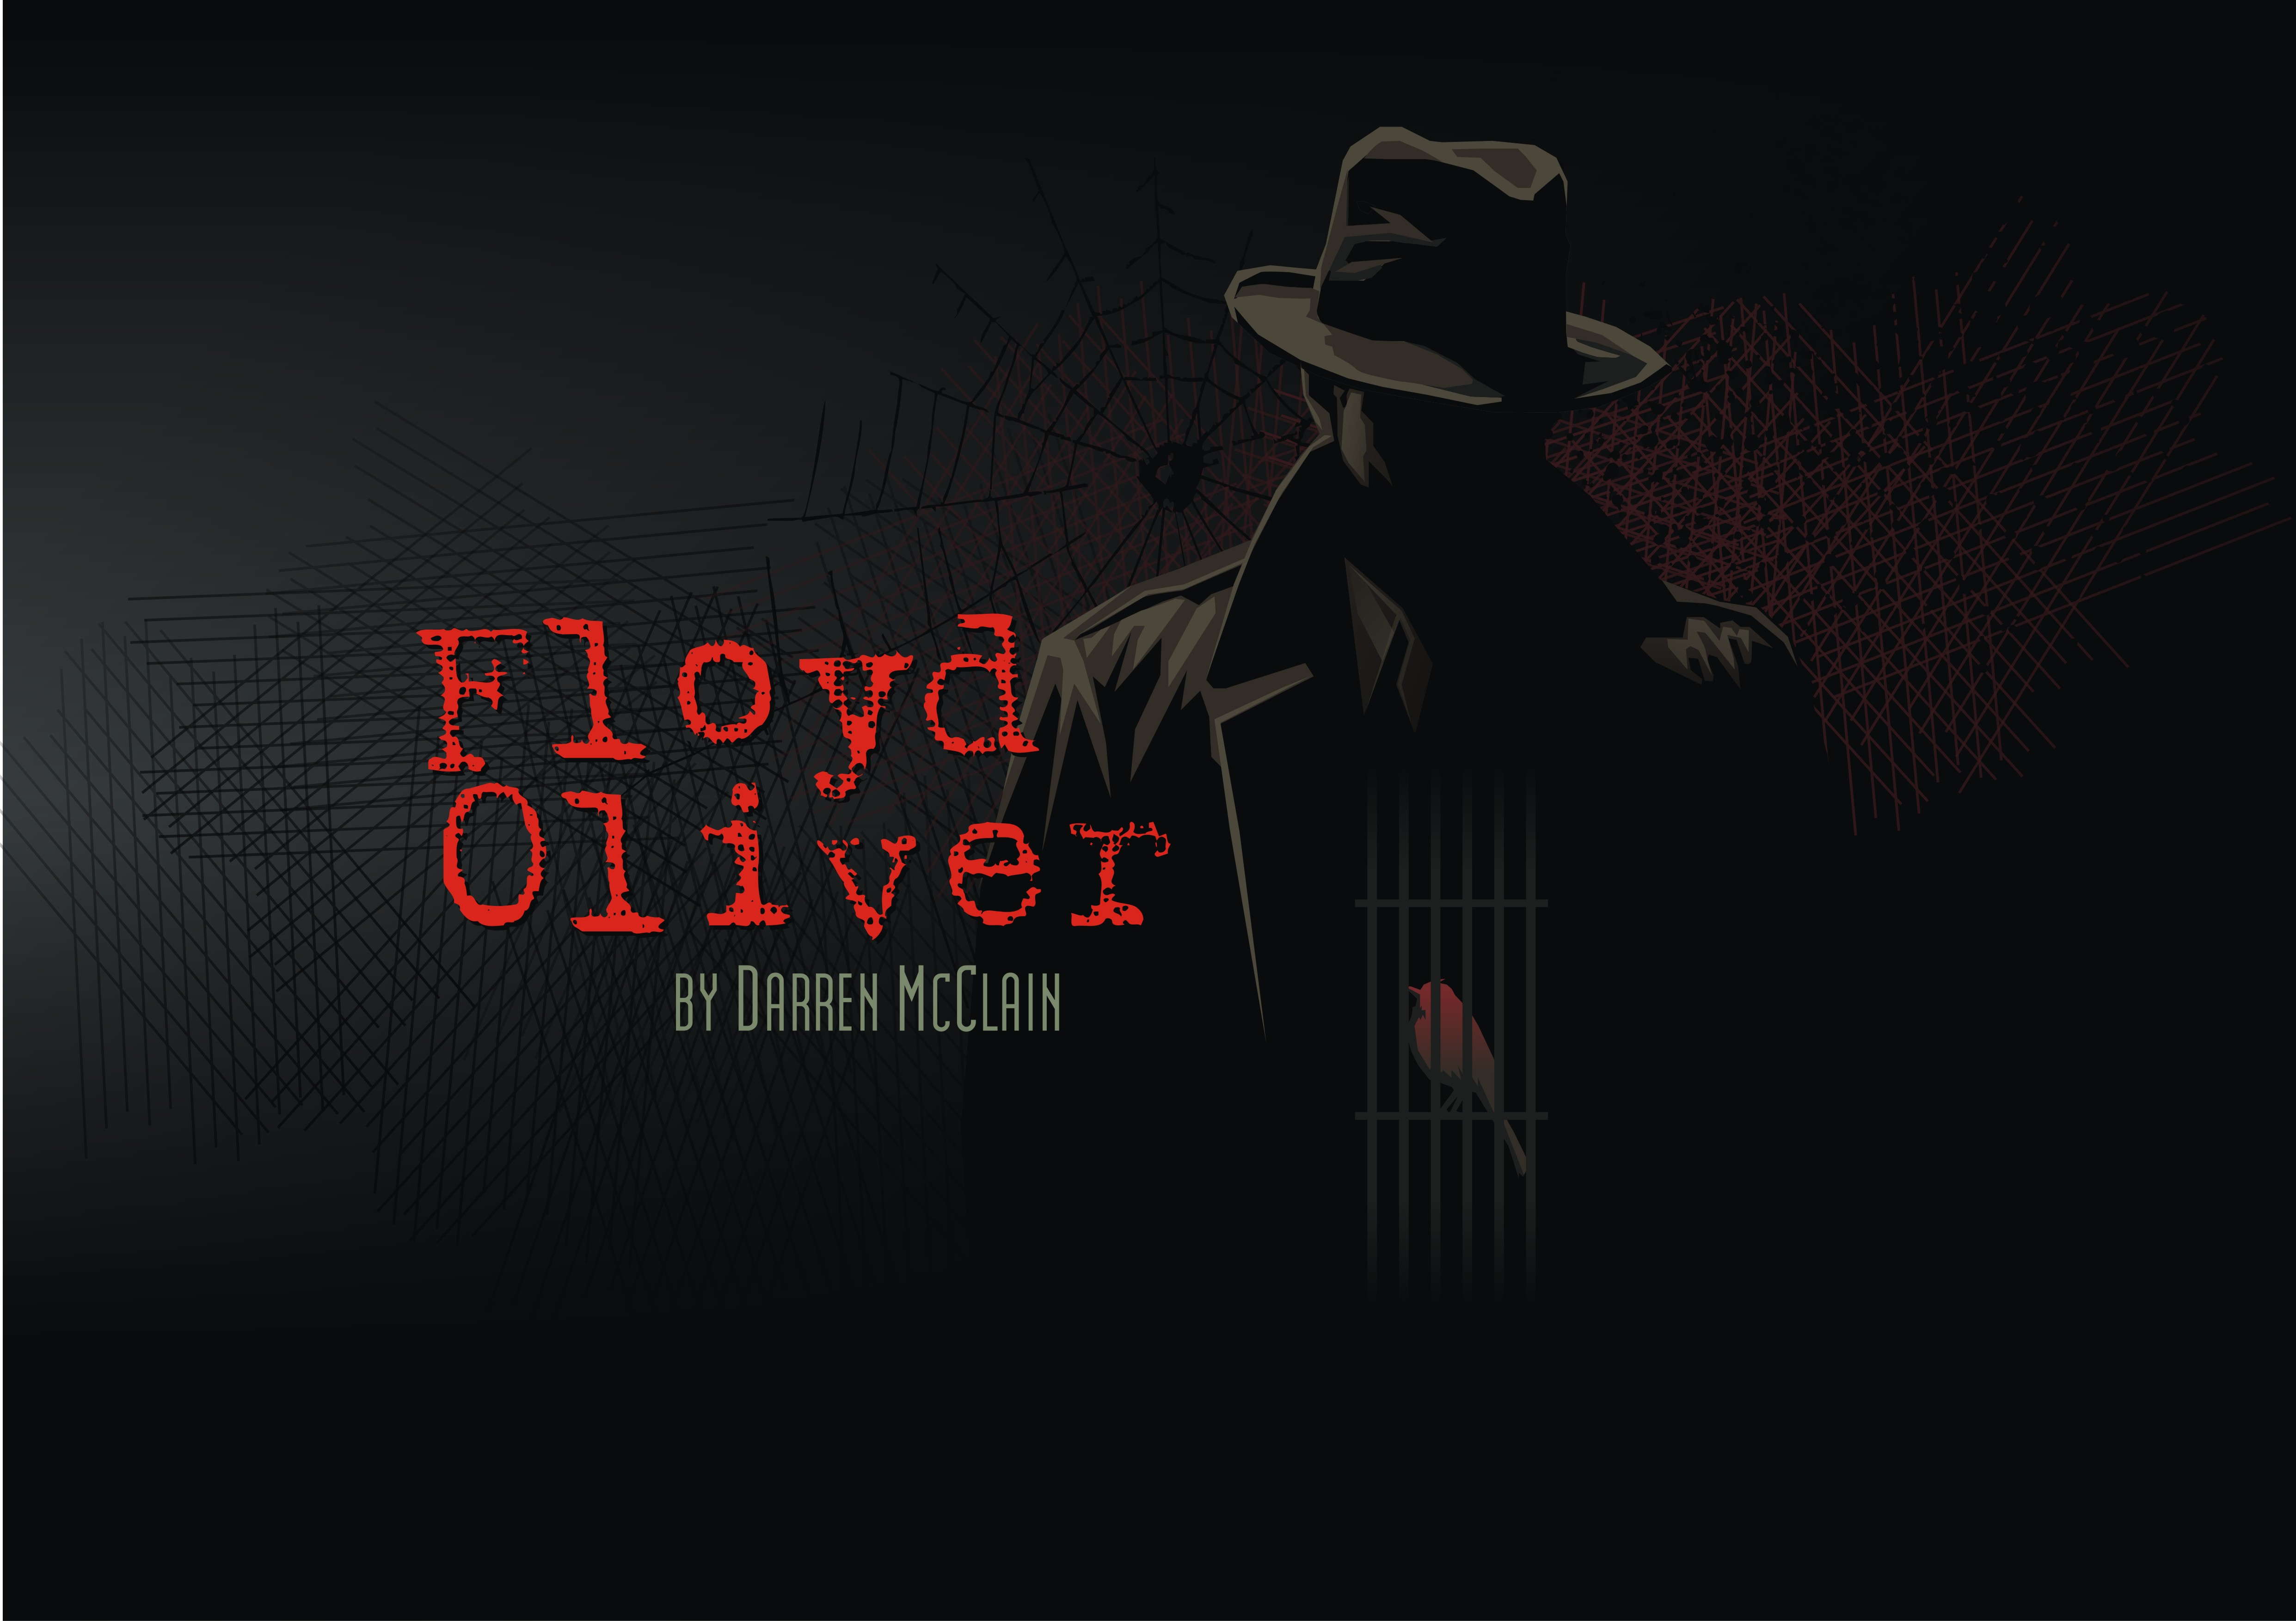 Dark Literary Serial Fiction Crime Thriller Artistic Cover